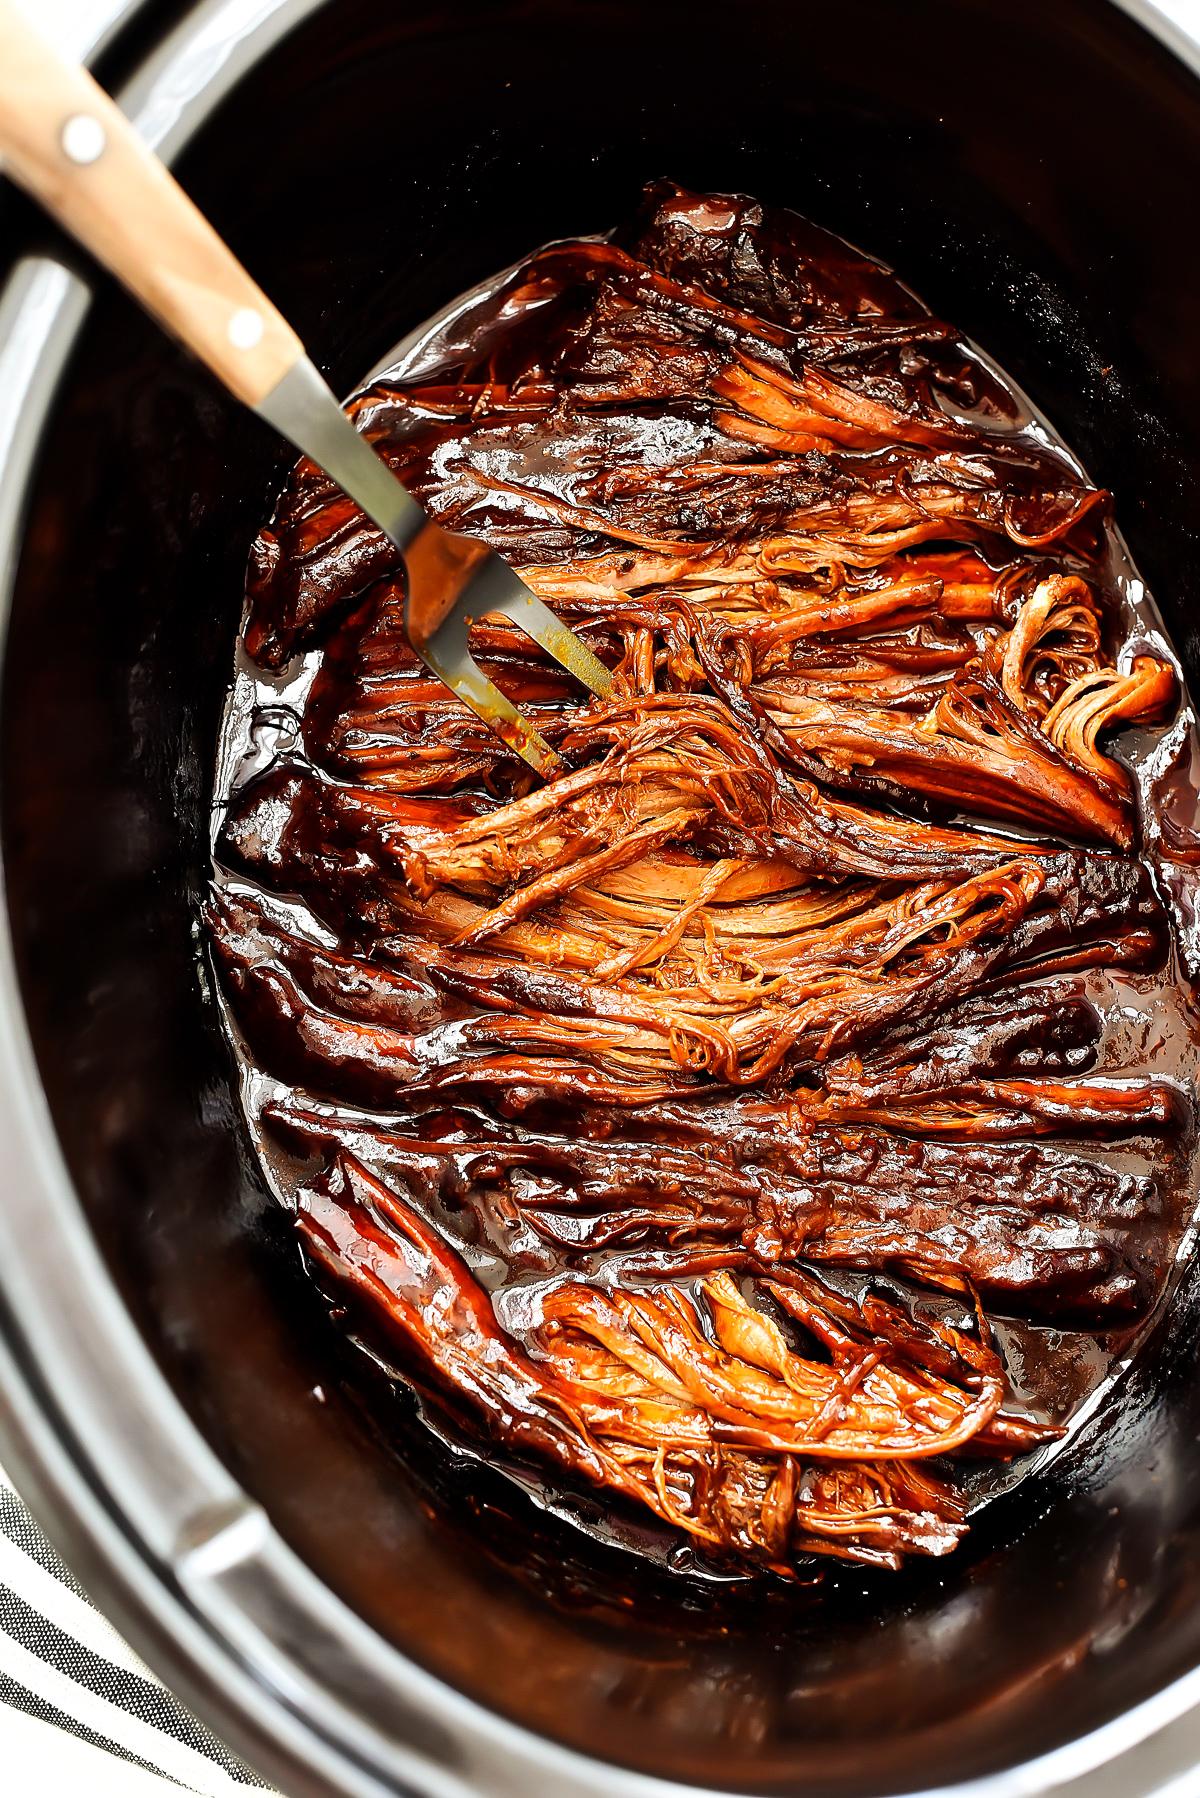 Best Crock Pot Brisket Recipe